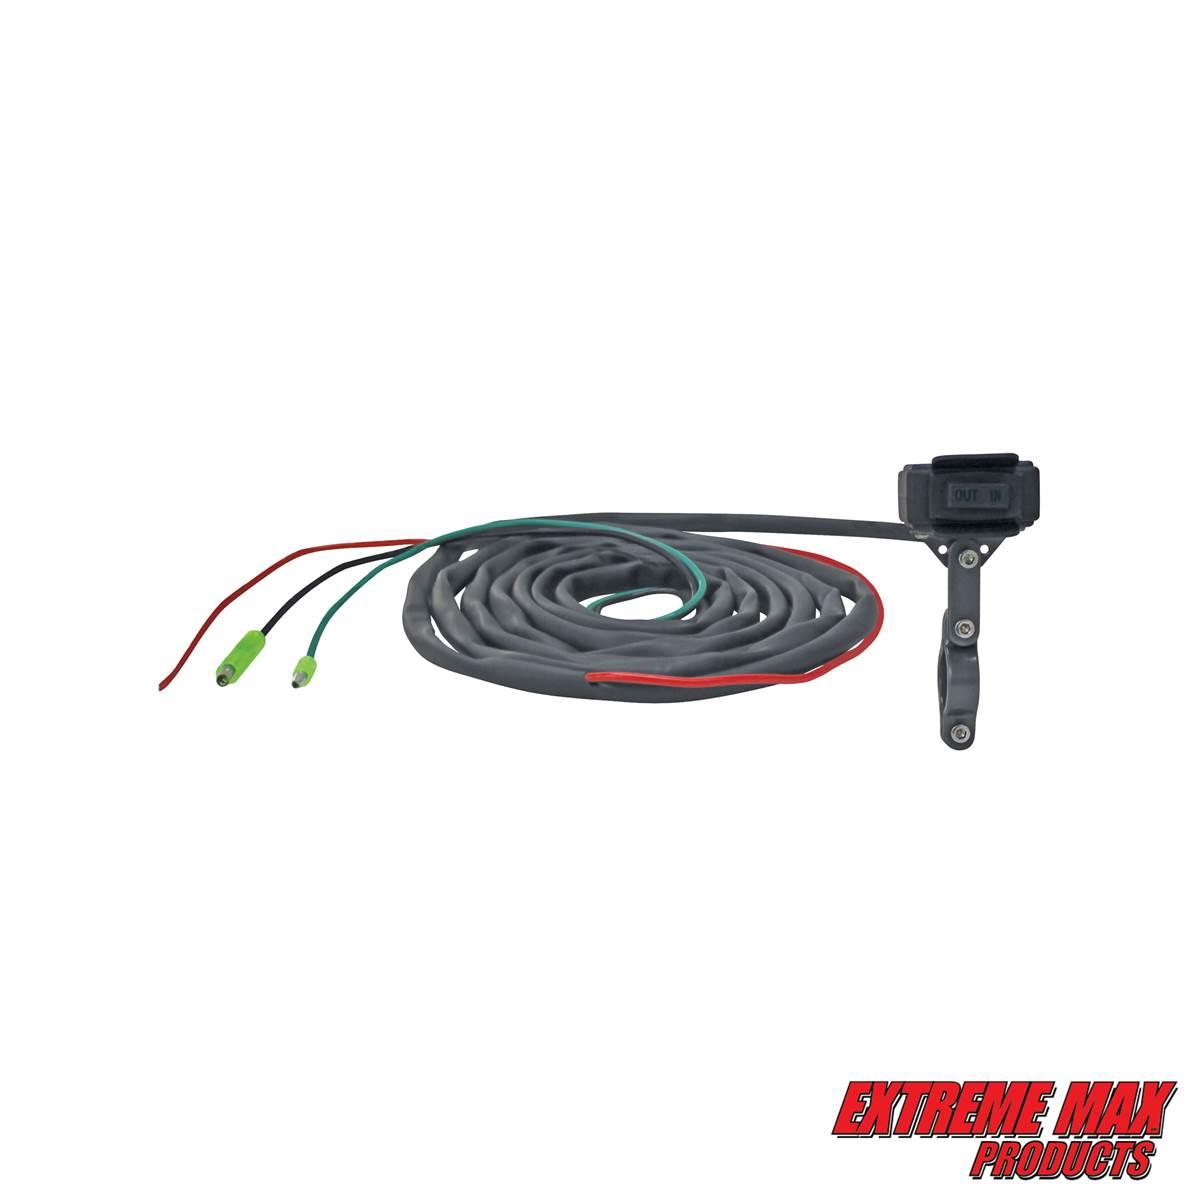 hight resolution of extreme max 5600 3175 universal waterproof atv winch handlebar remote rocker switch